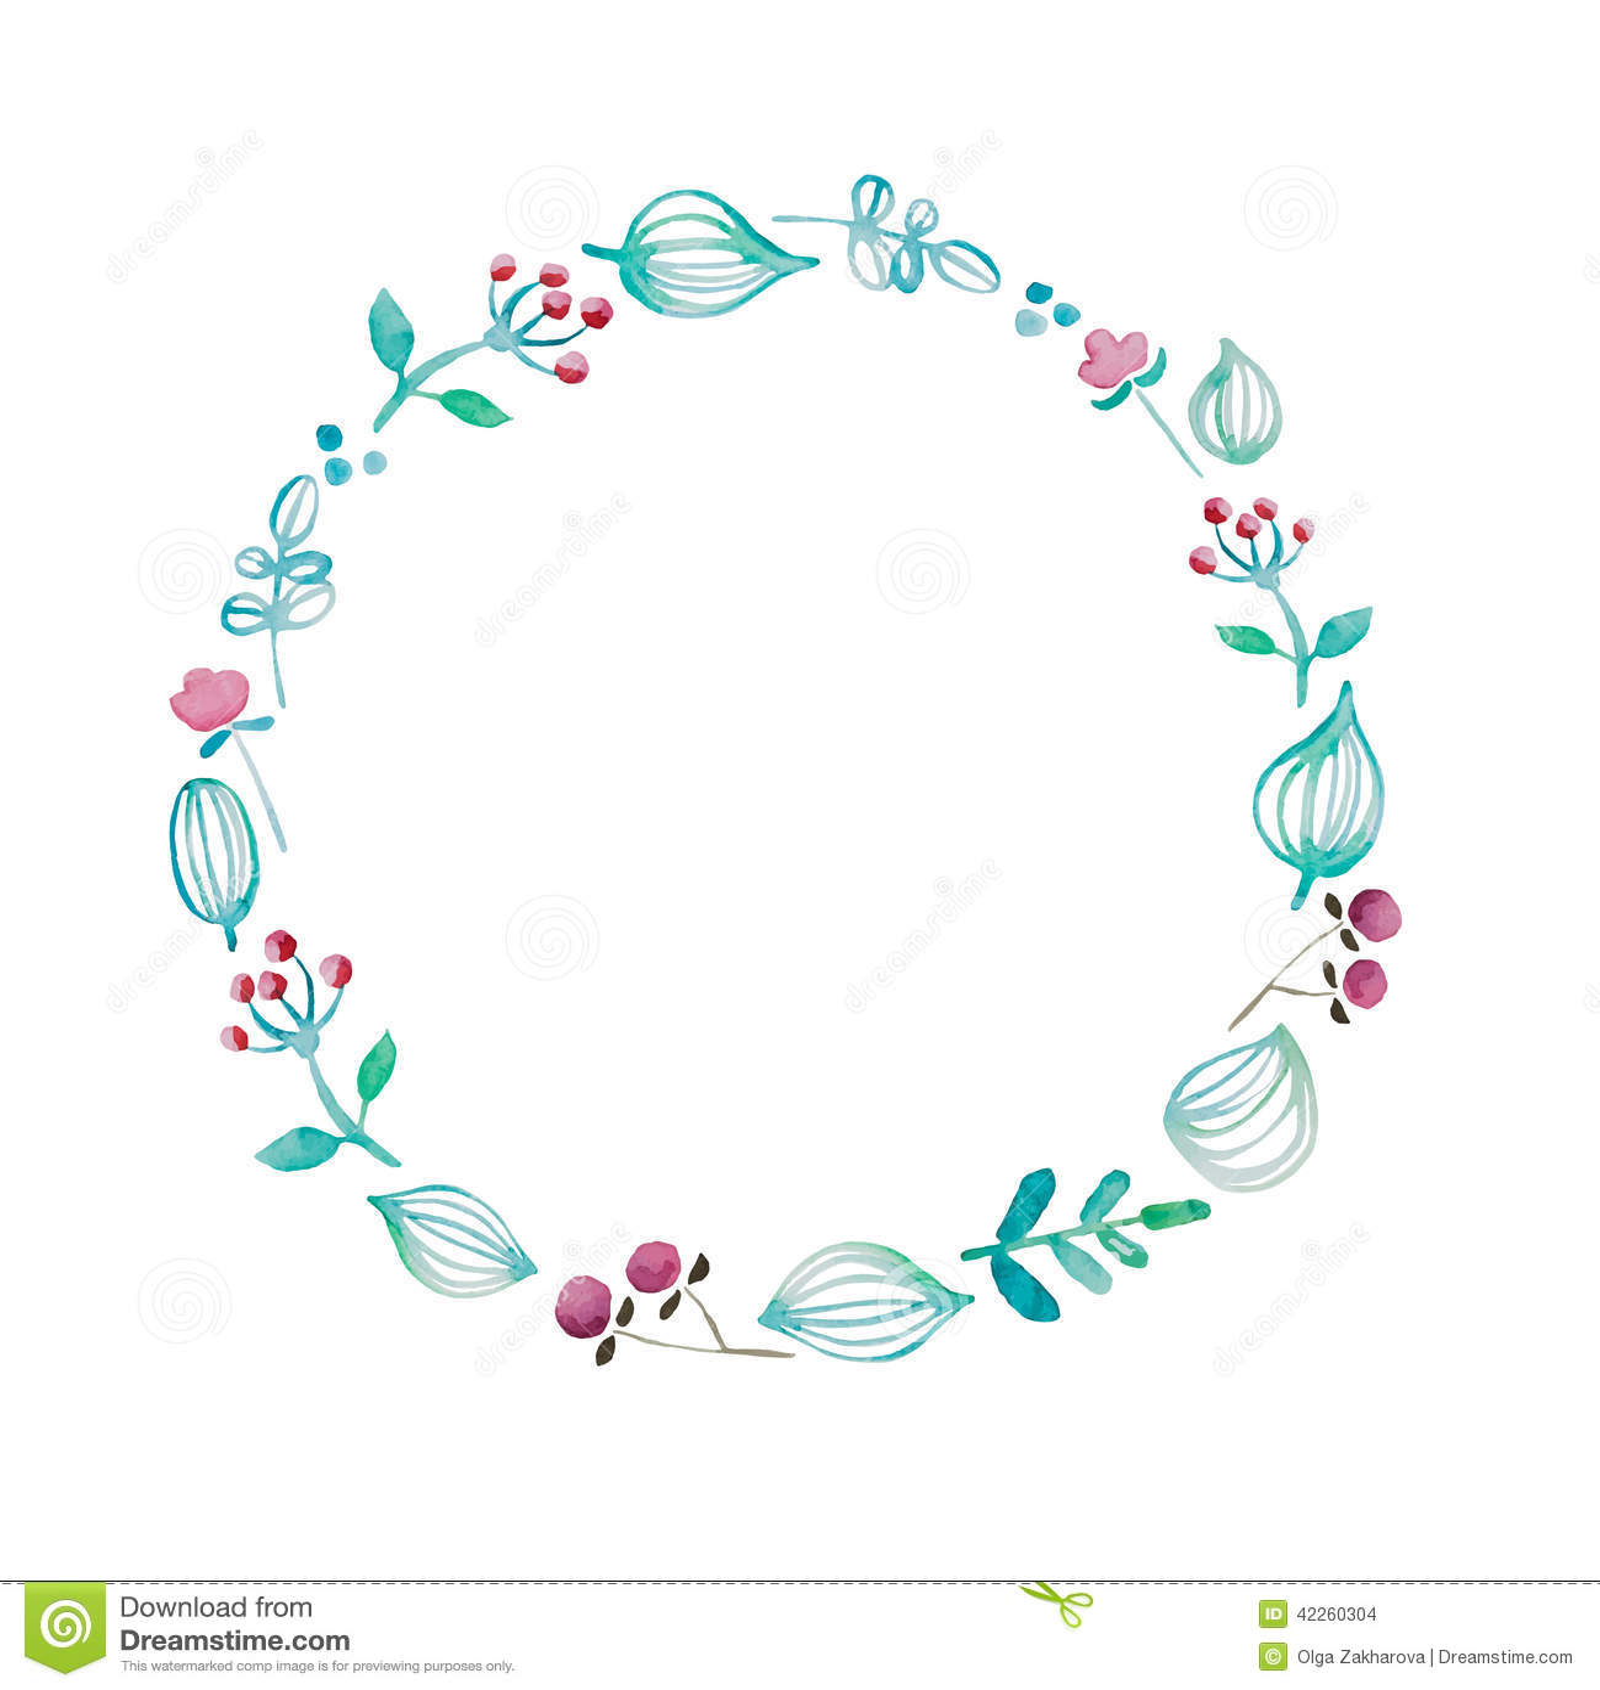 Watercolor Flower Frame Stock Vector - Image: 42260304